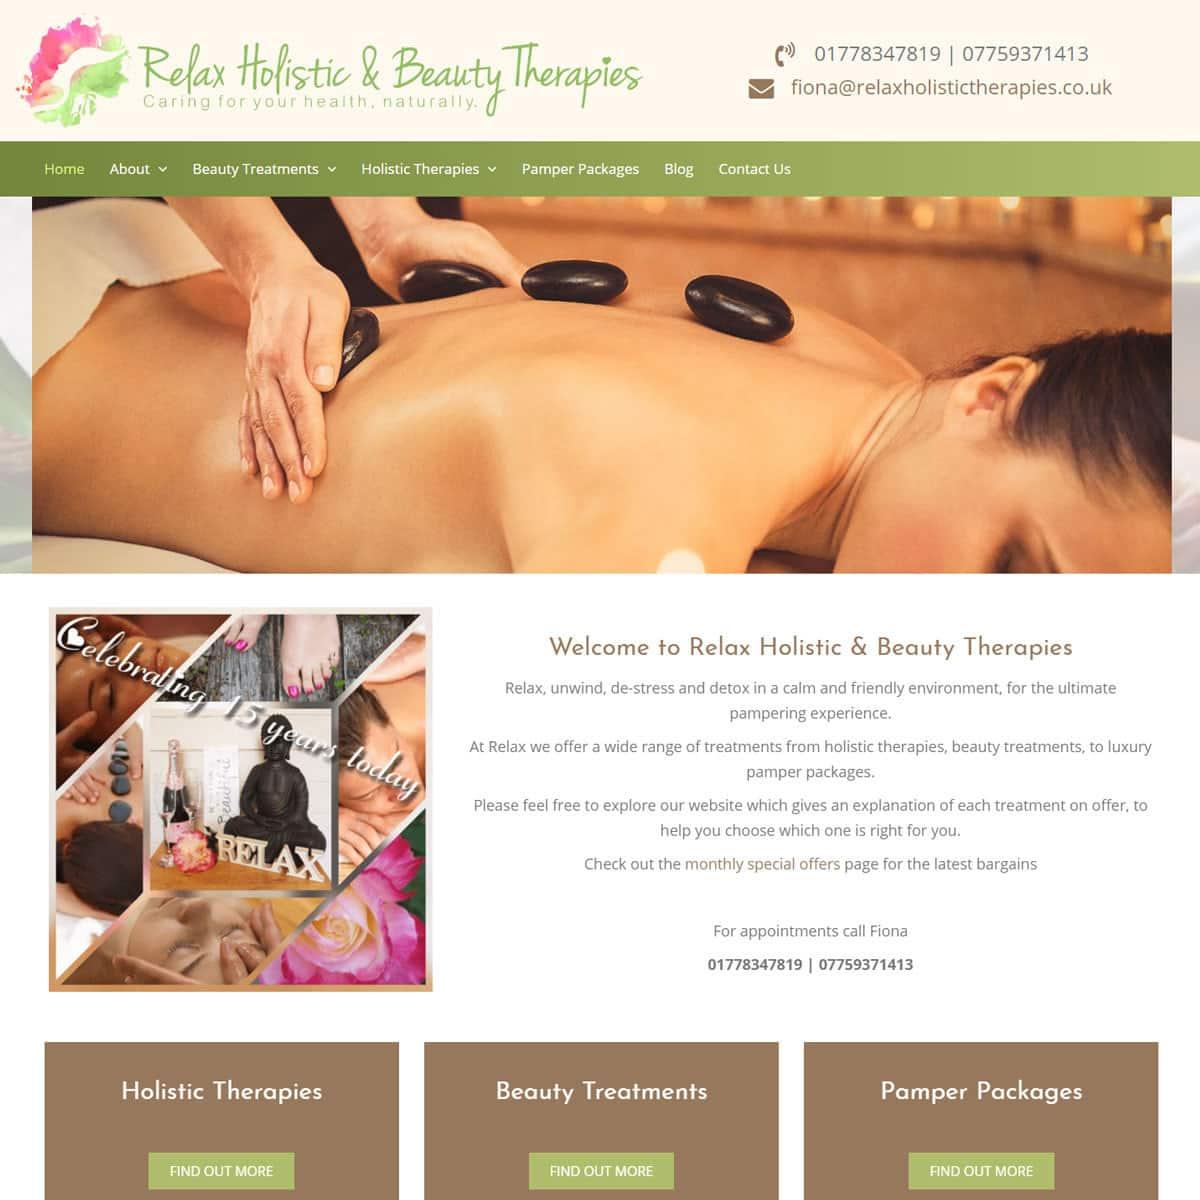 relaxholistictherapies